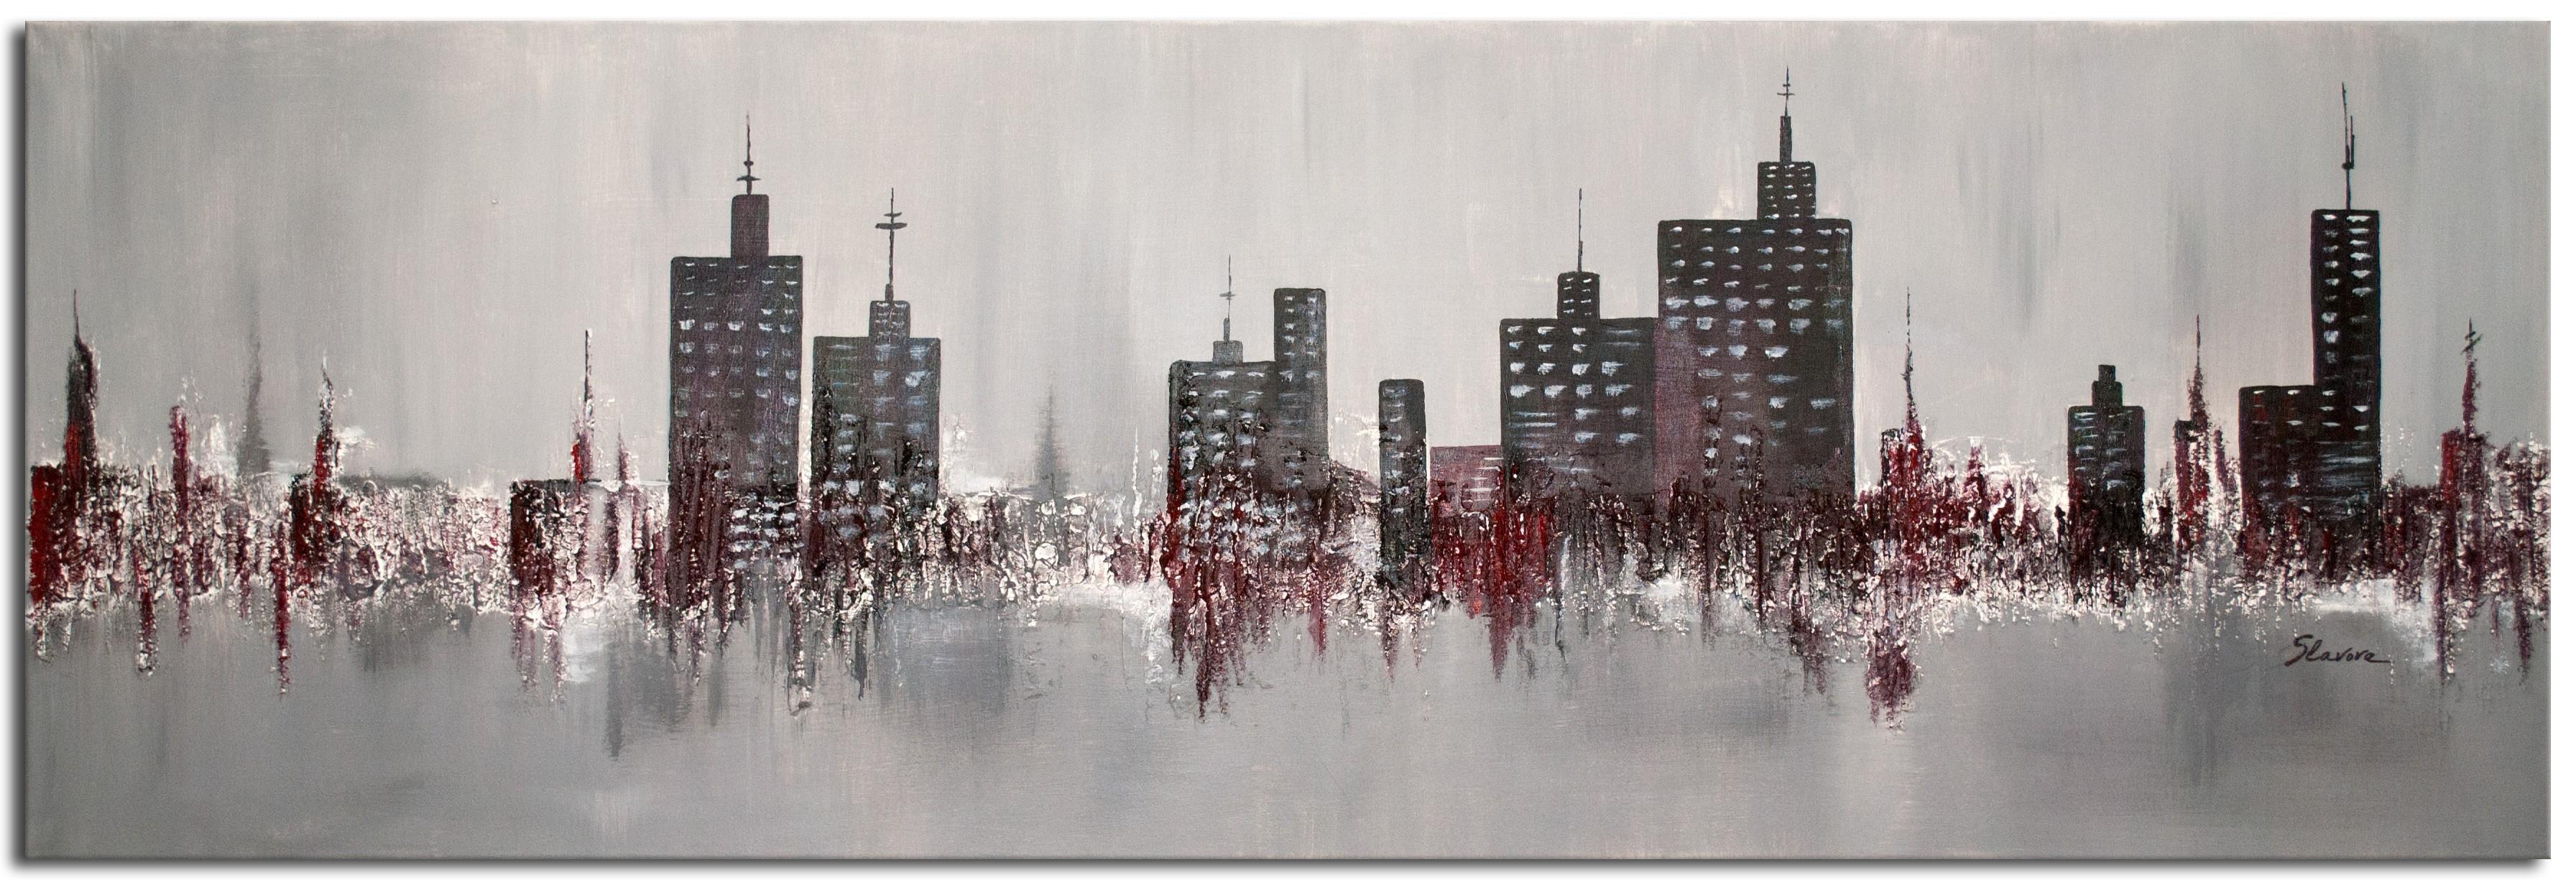 Wandbilder wohnzimmer skyline acrylbild wandbilder slavova art